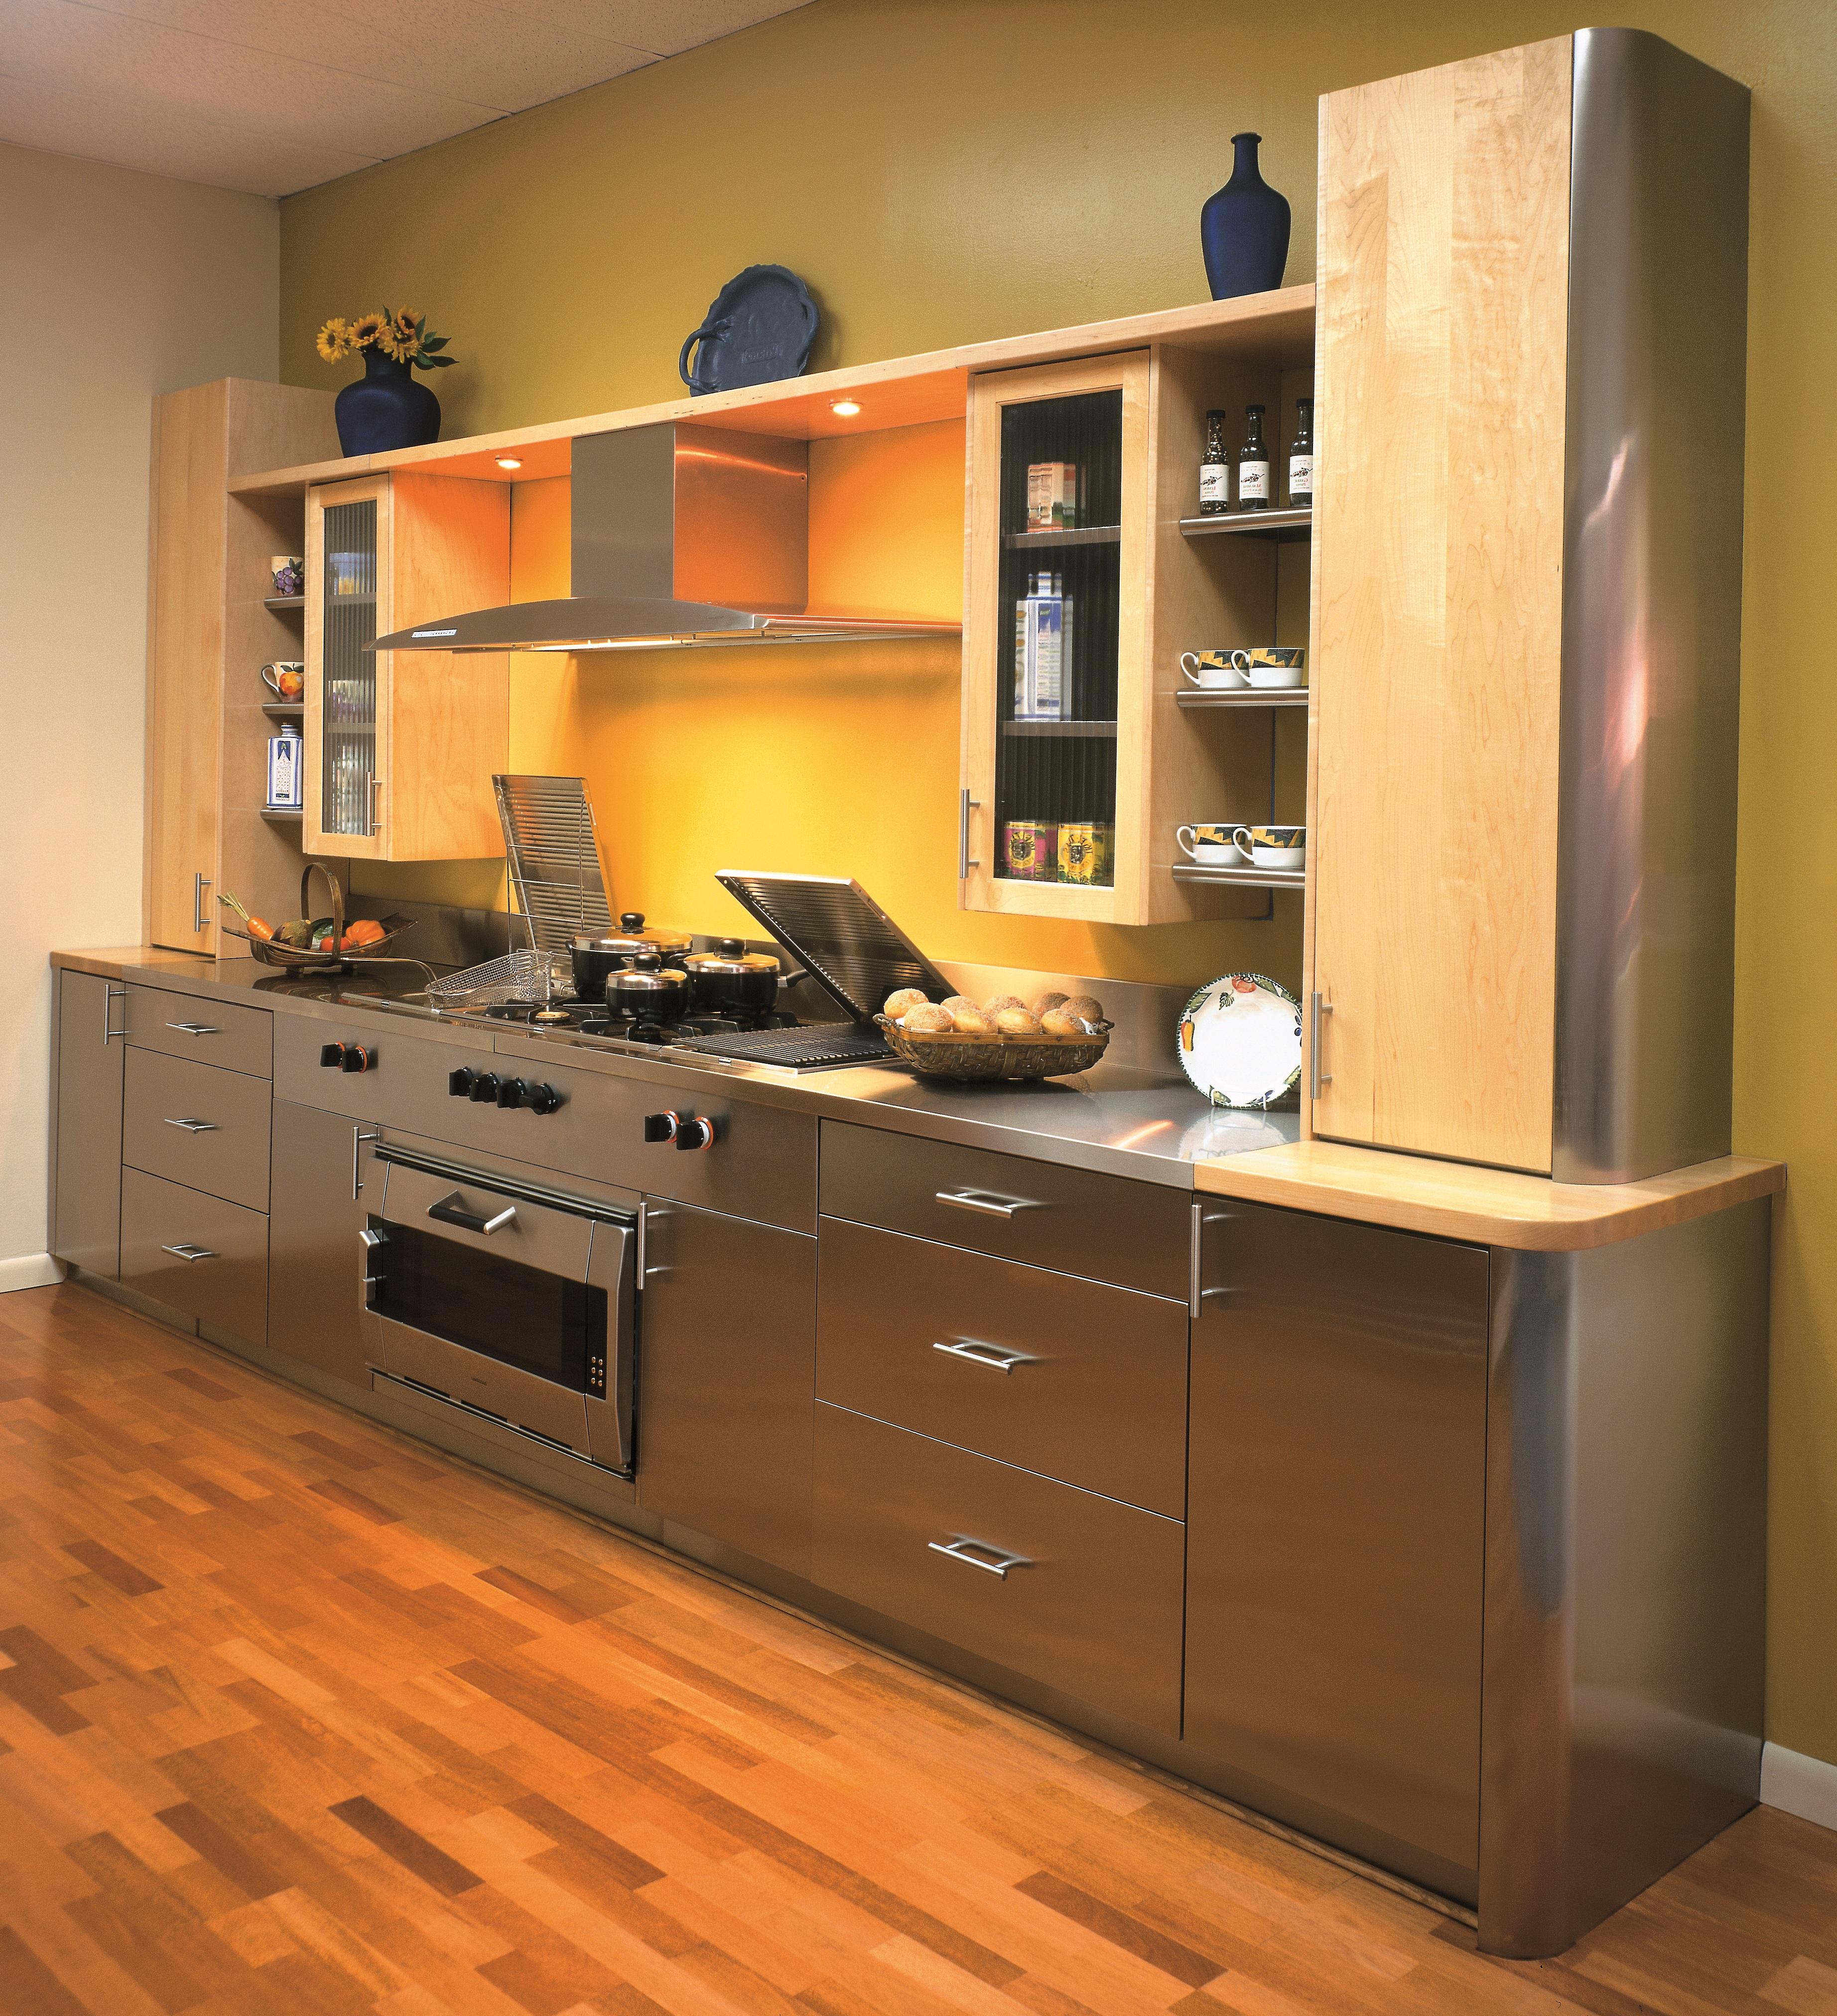 Metal Cabinets Kitchen: Stainless Steel Kitchen Cabinets